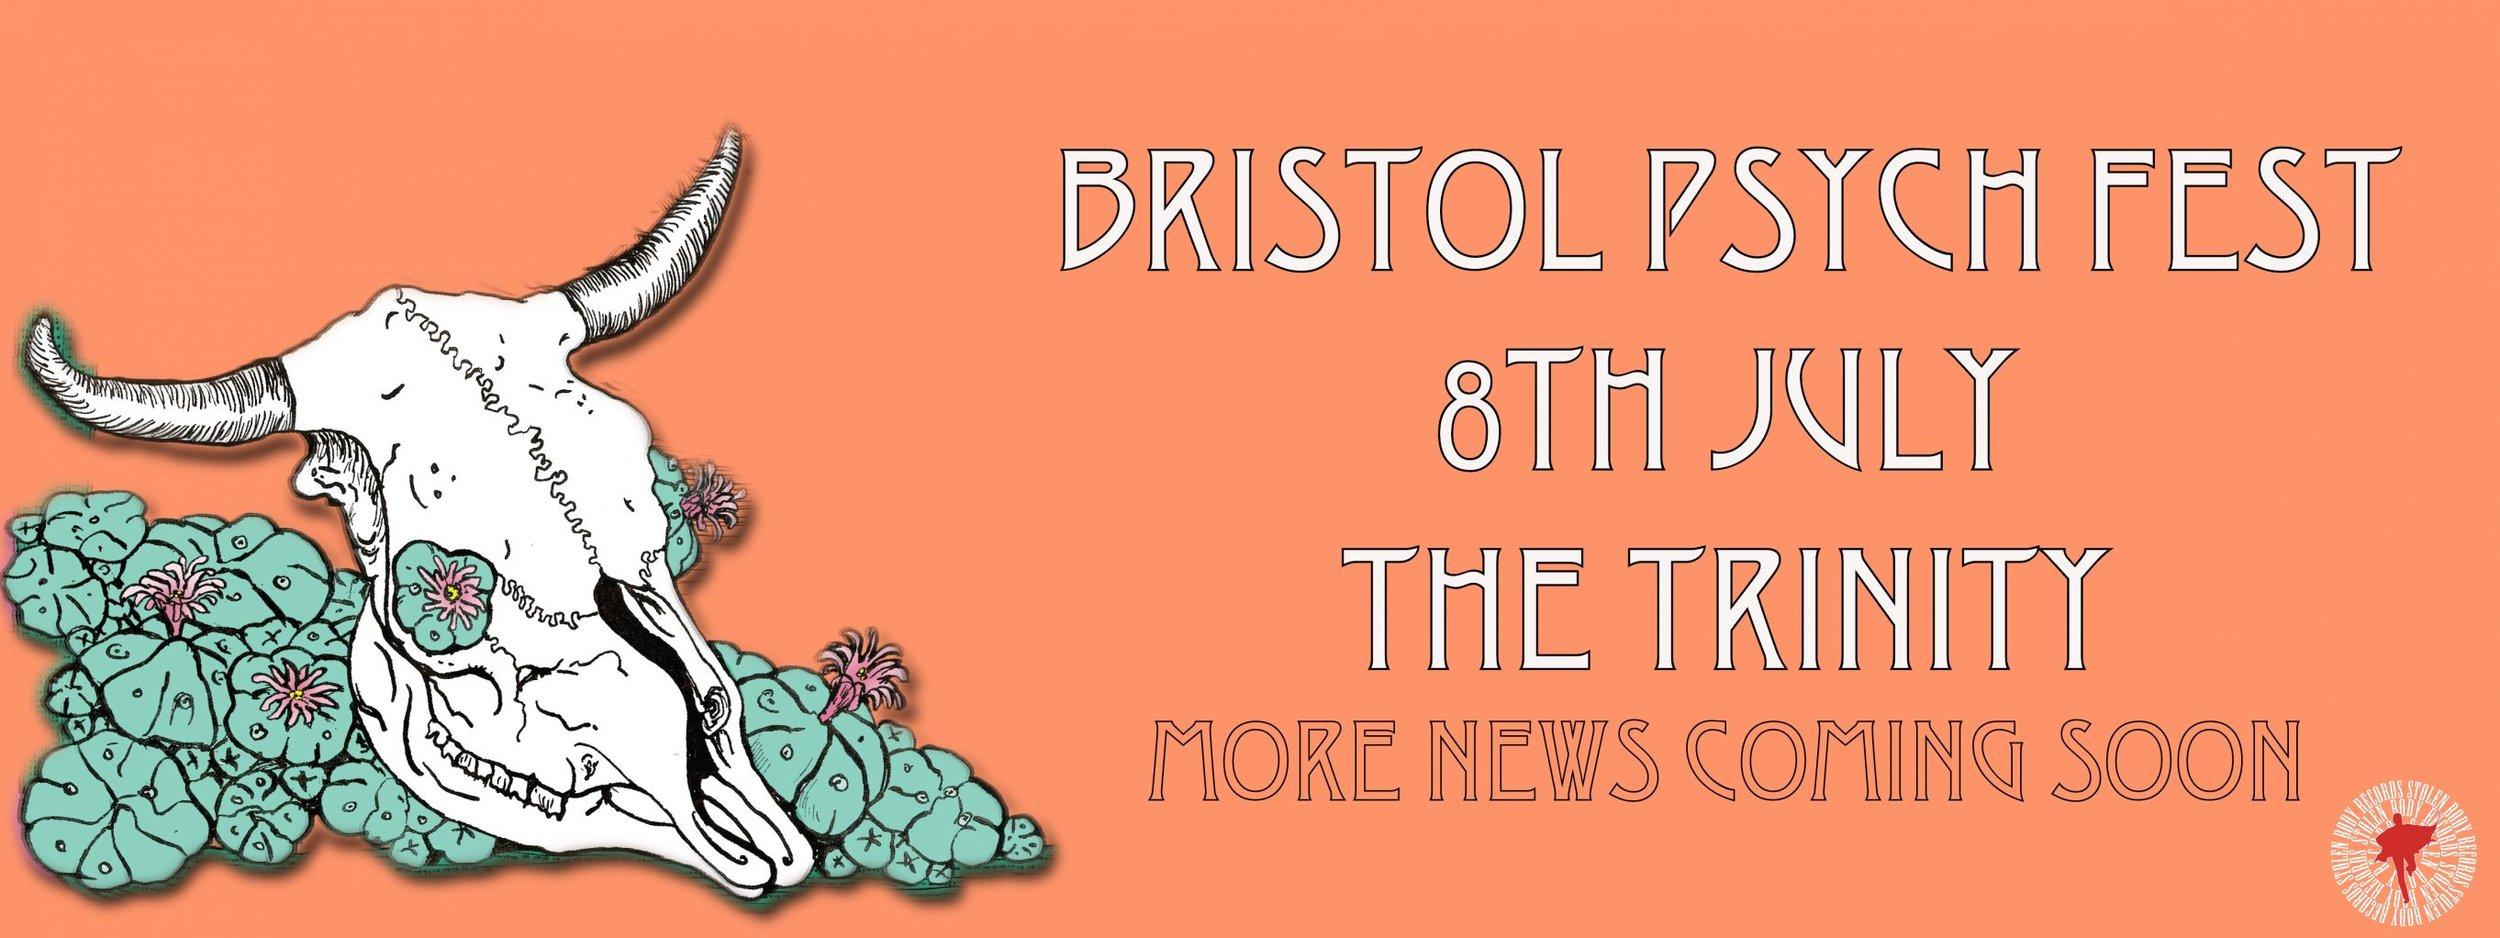 Bristol Psych Fest 4